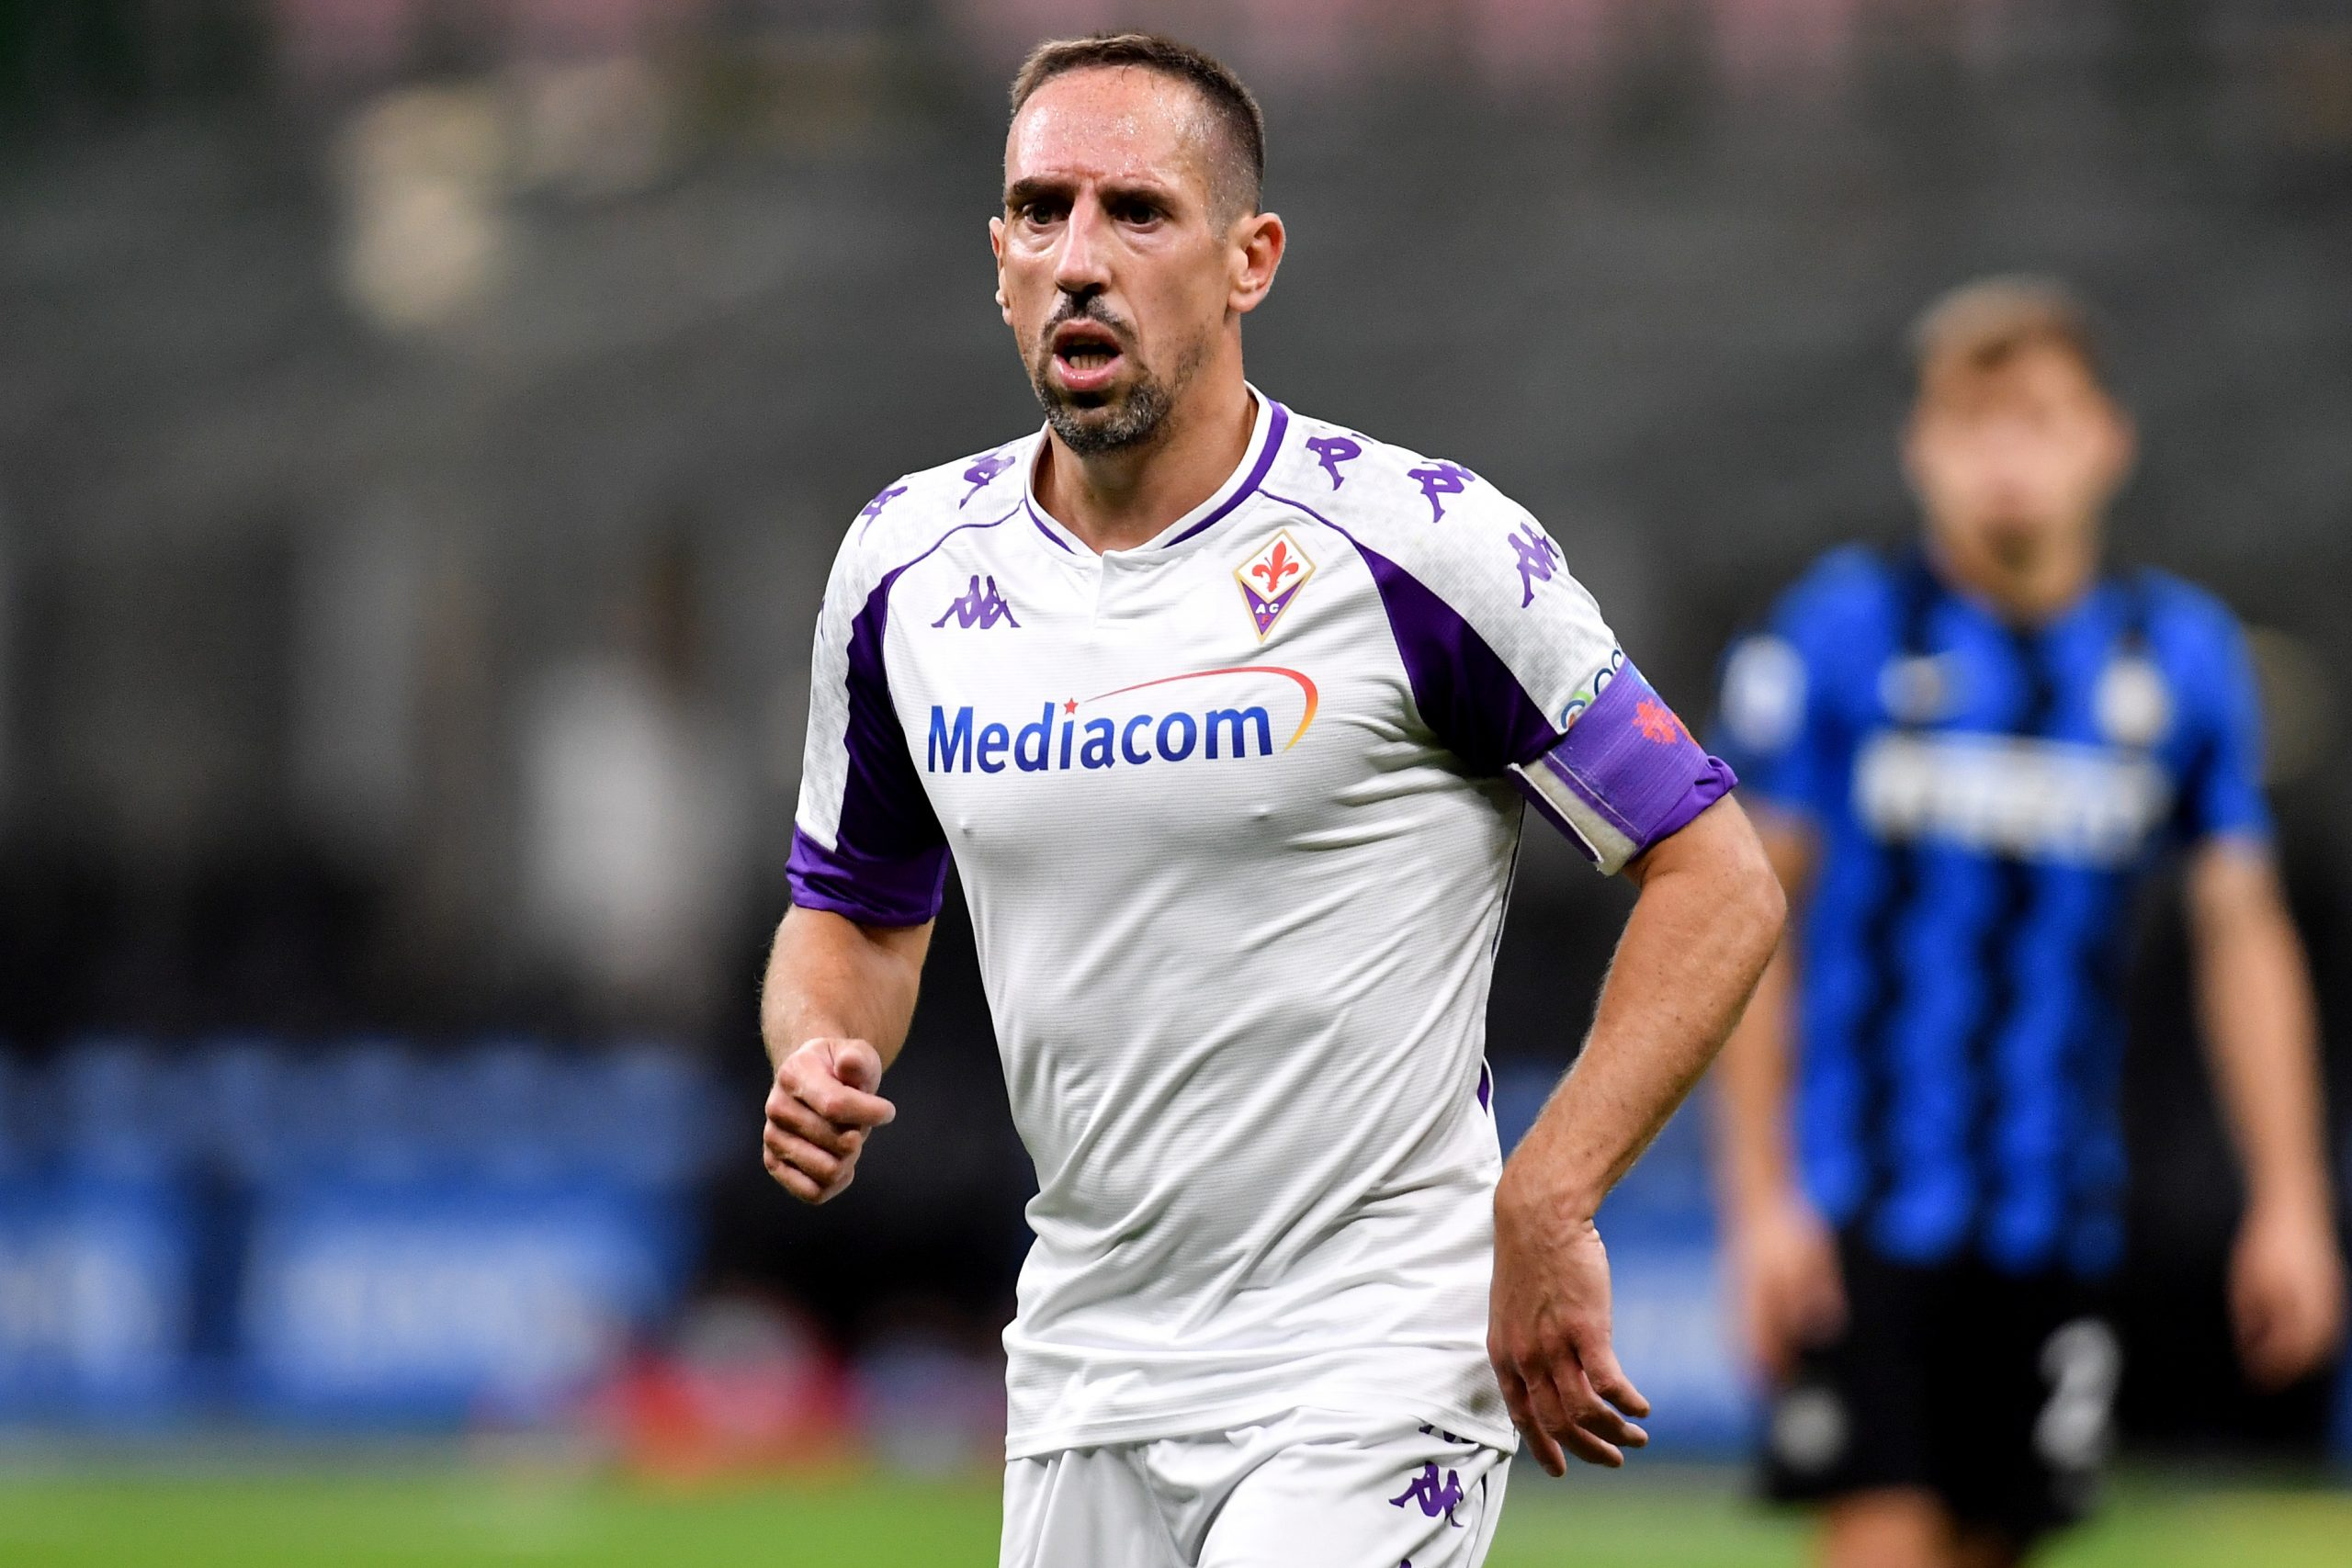 Ex-OM : Ribéry cartonne encore avec la Fiorentina